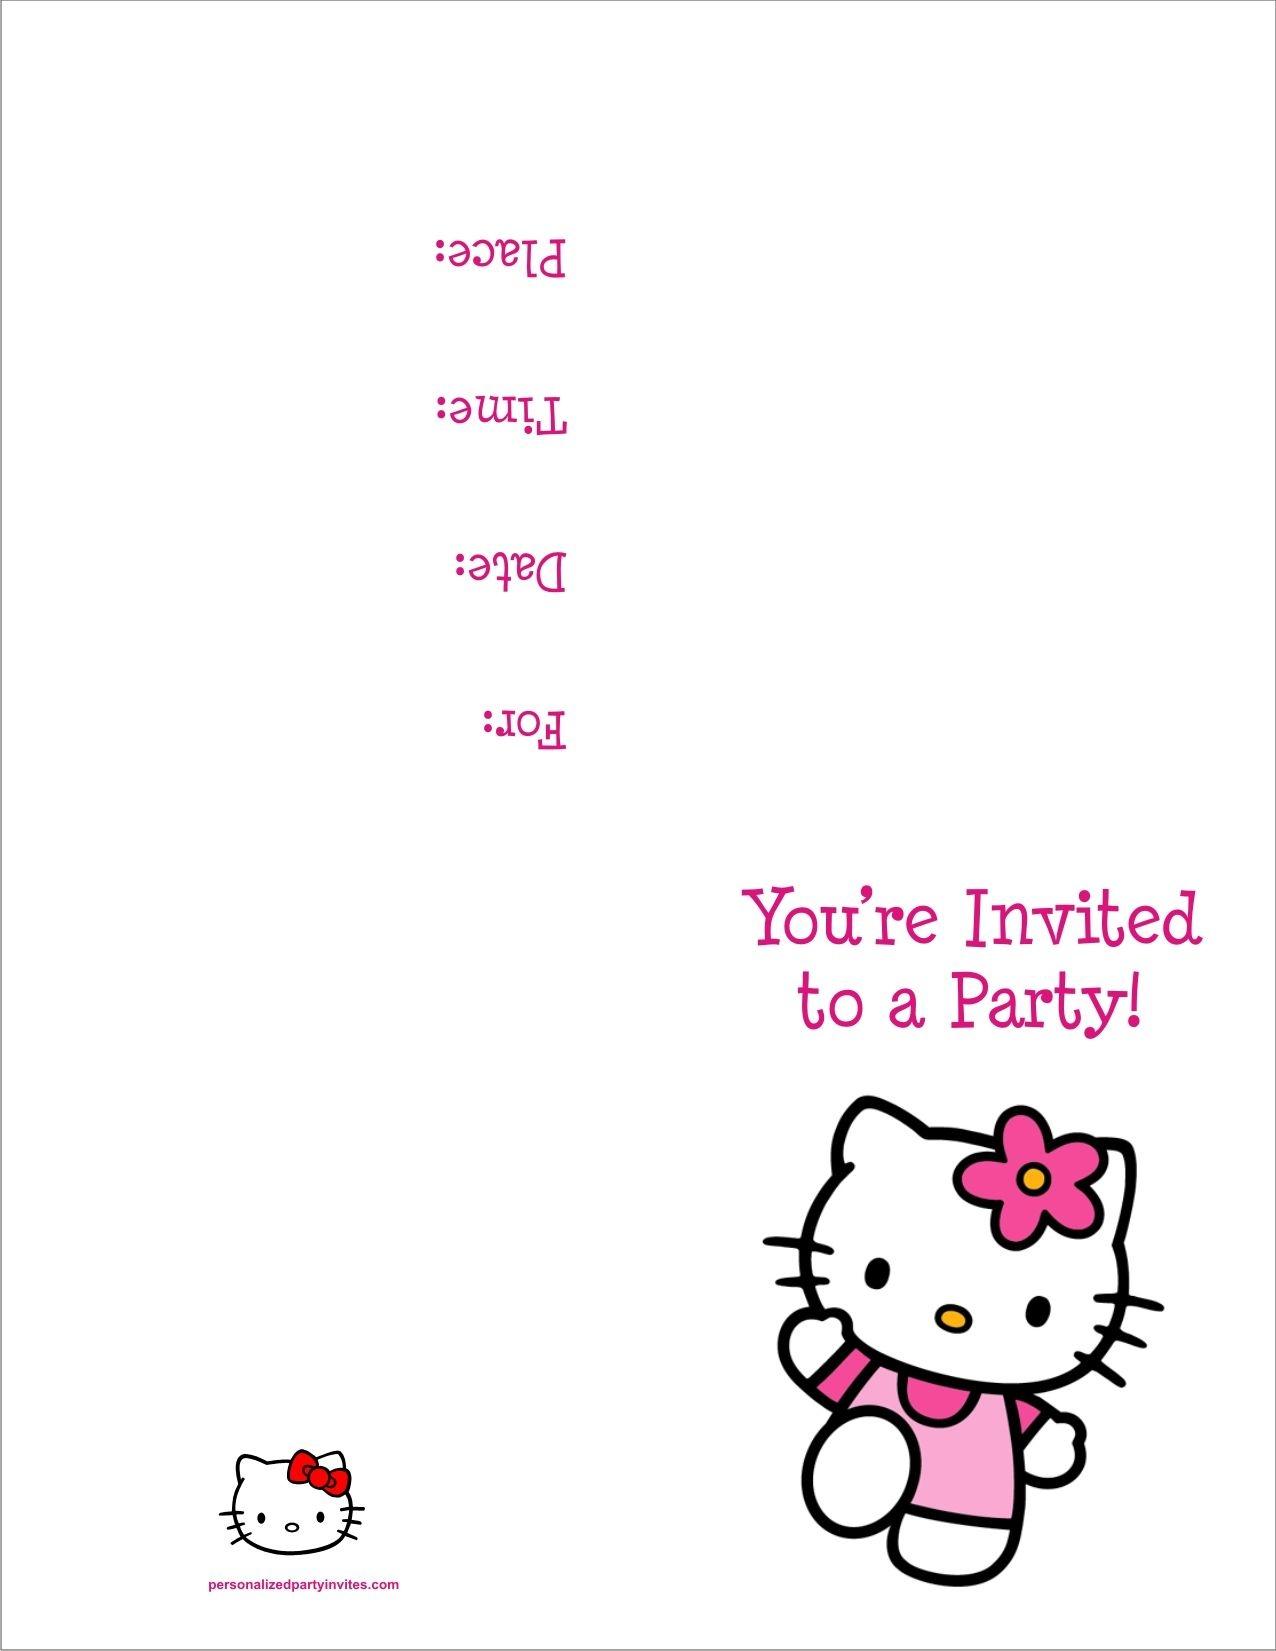 Pinrachel Benson On Hello Kitty Bday   Hello Kitty Birthday - Free Printable Hello Kitty Baby Shower Invitations